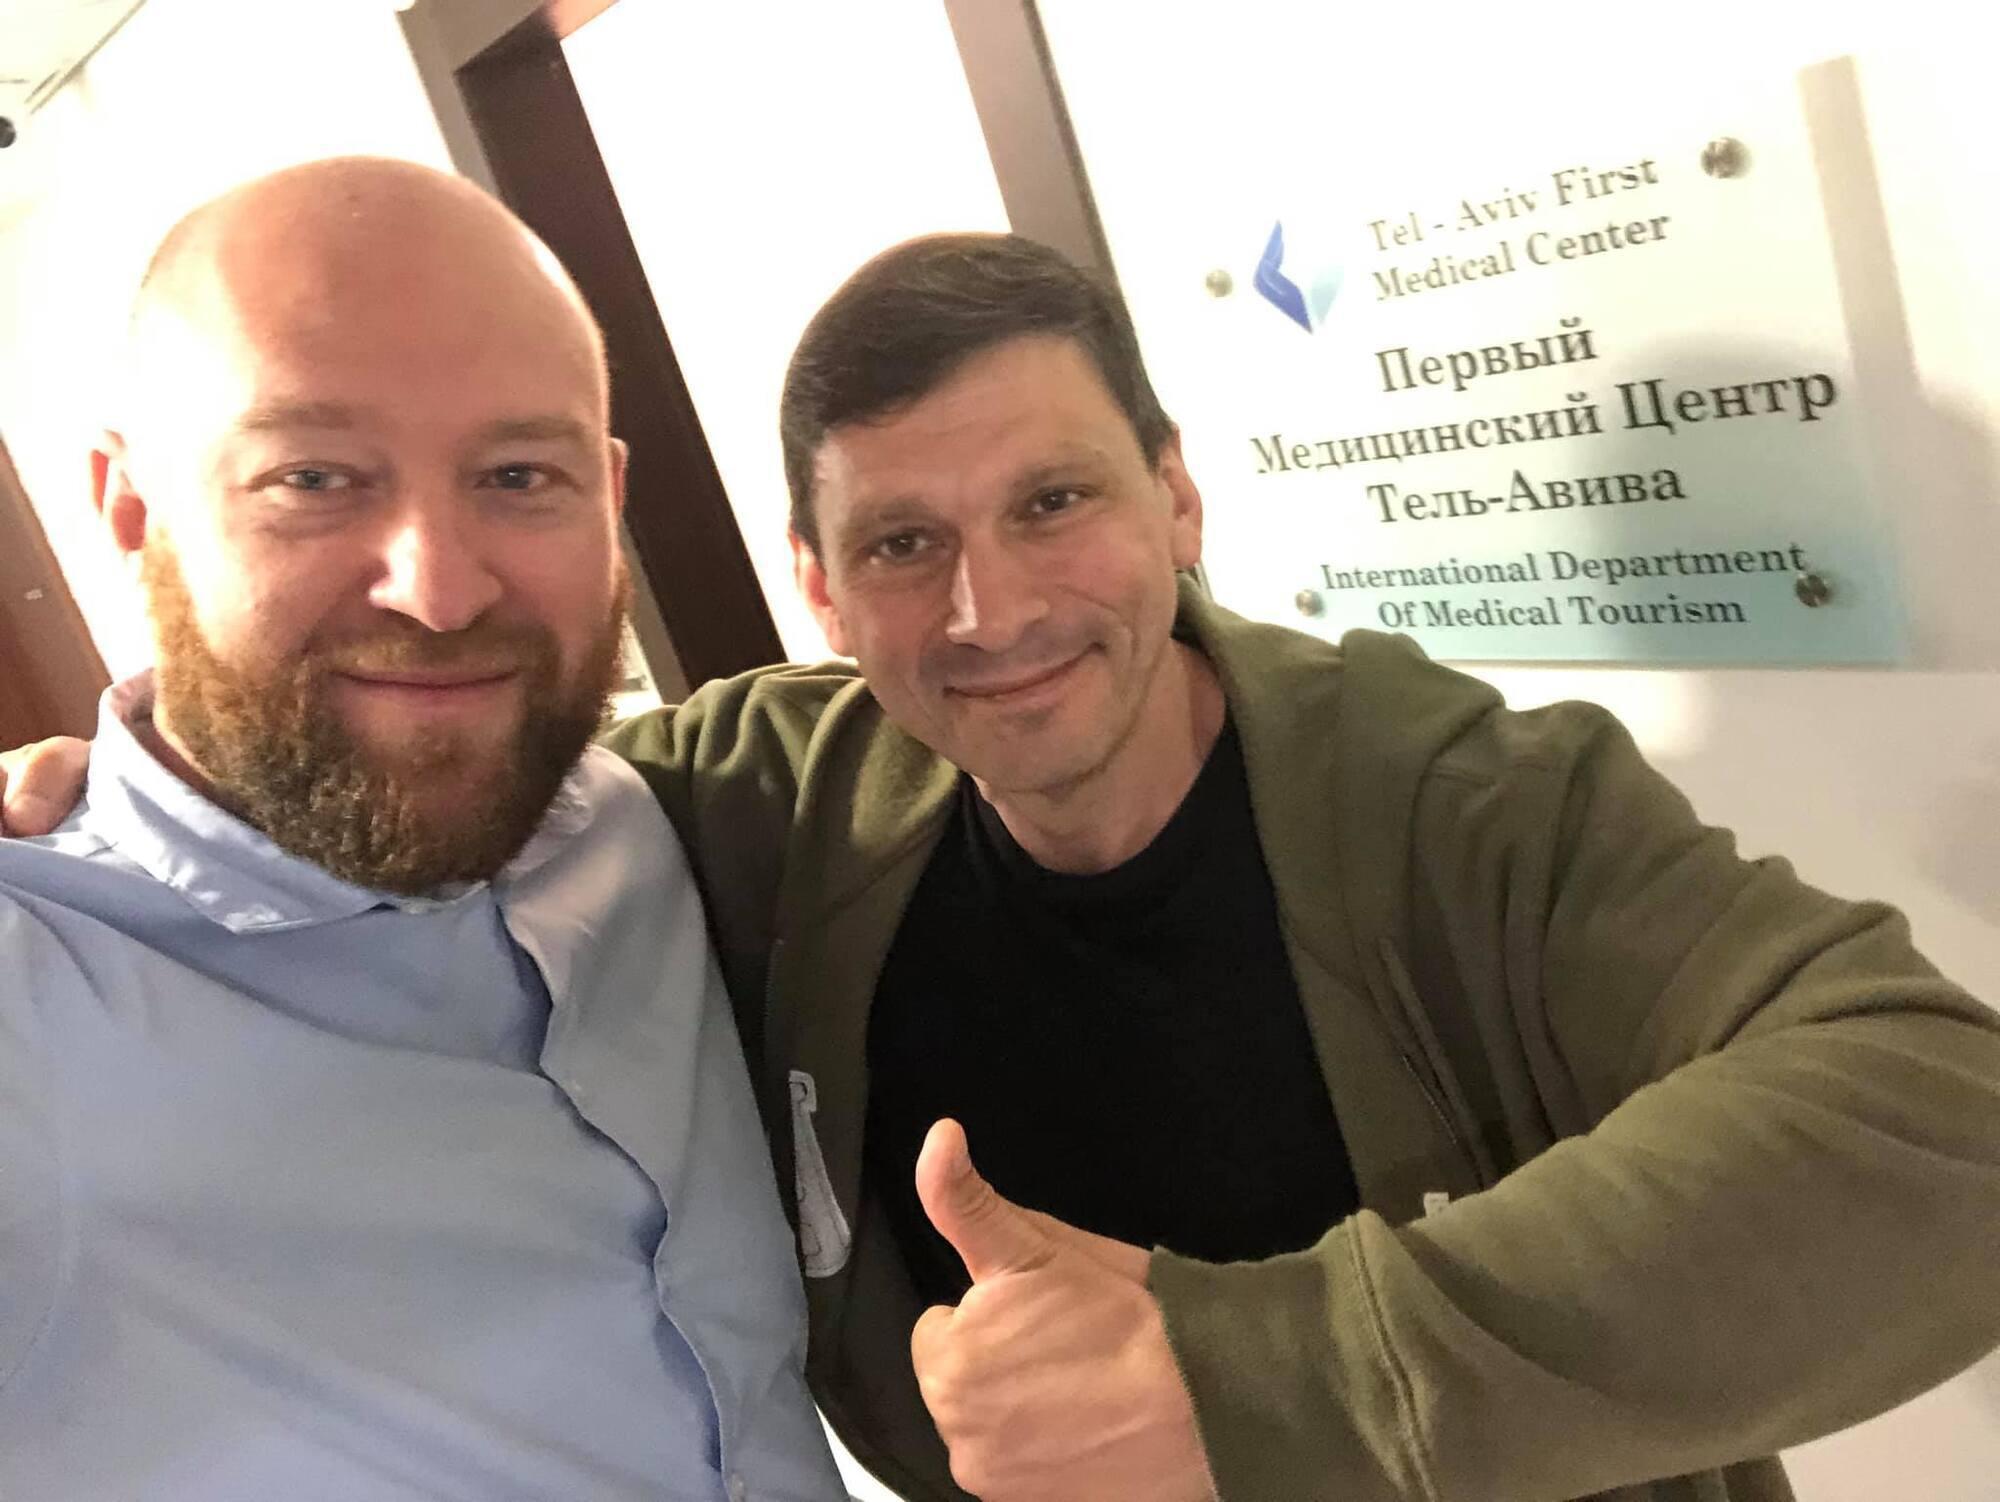 Журналист Андрей Цаплиенко